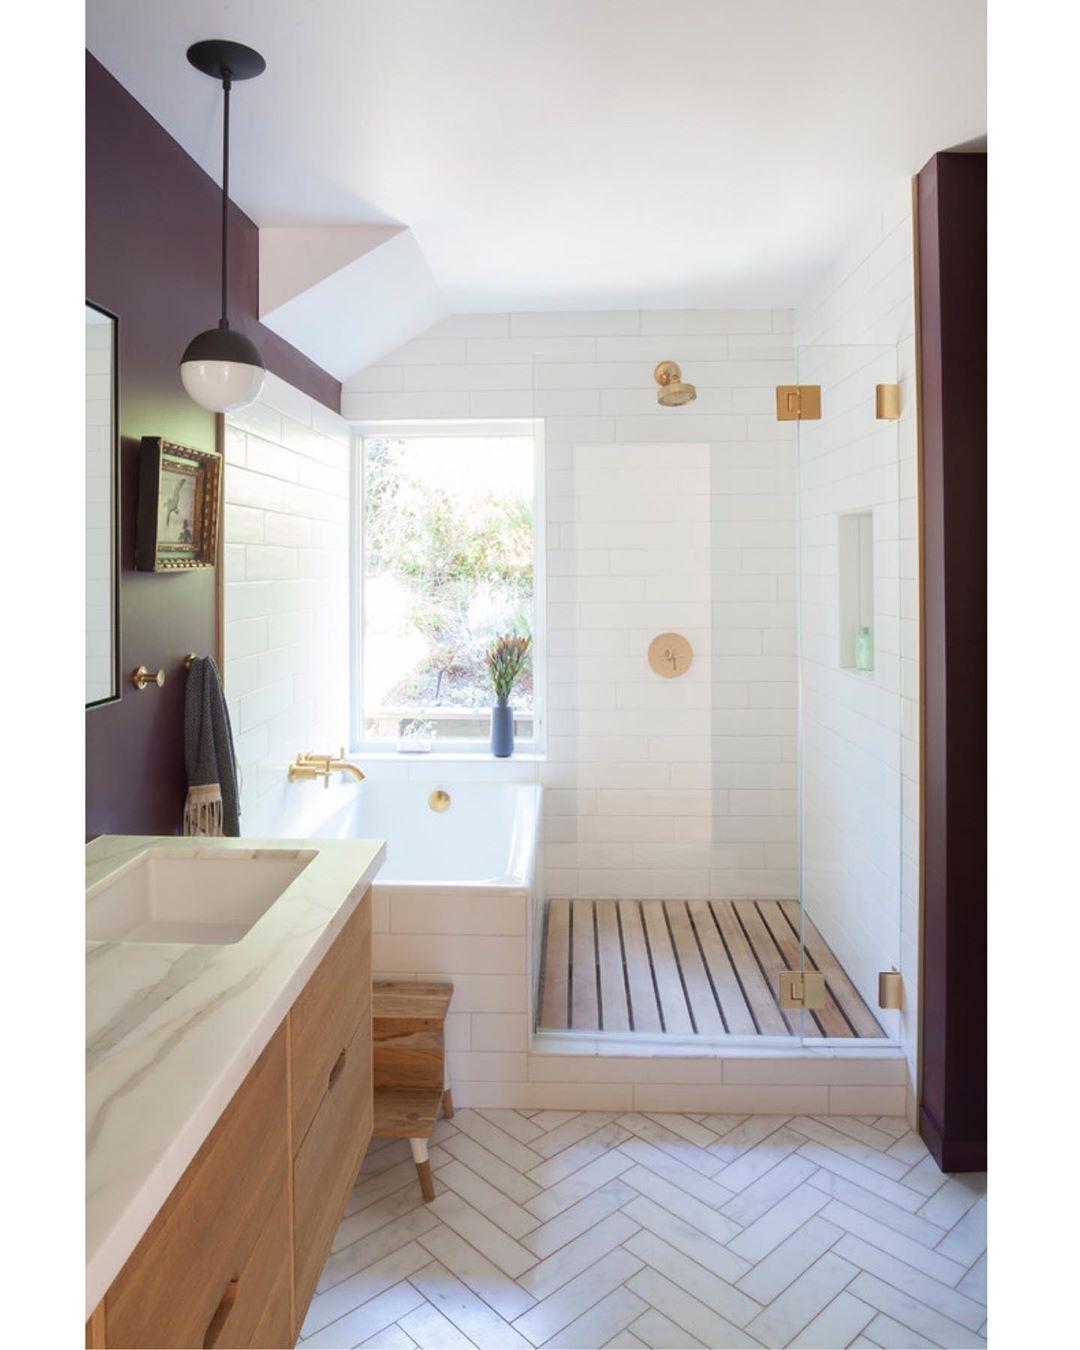 Audrey Crisp On Instagram Gorgeous Bathroom Design I Love The Flooring And Wood Slats In Mid Century Modern Bathroom Modern Bathroom Modern Bathroom Design